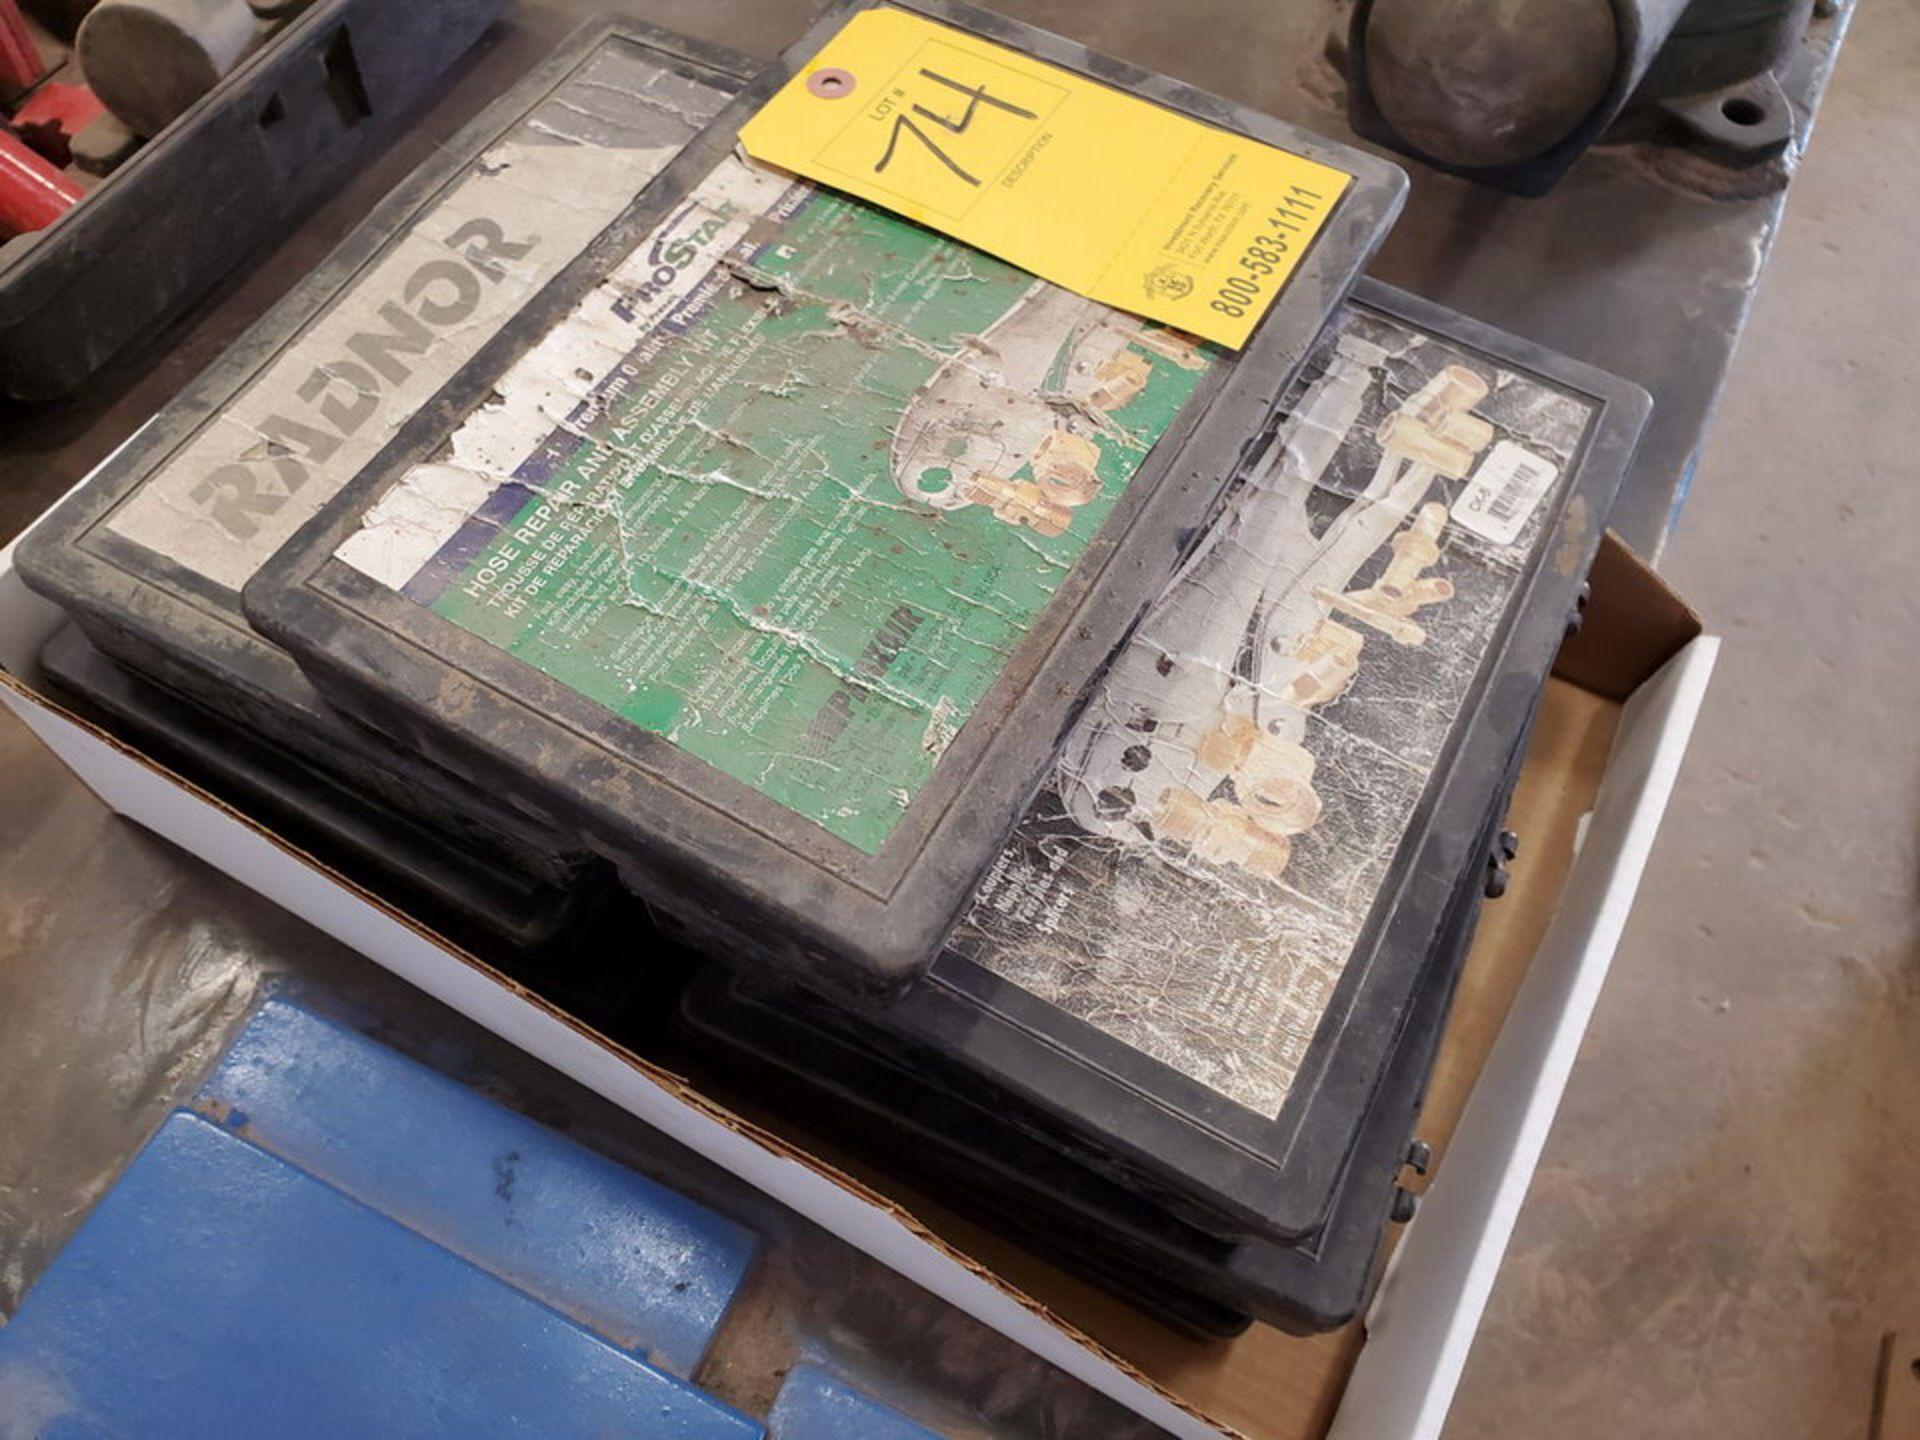 Radnor & Frostar (7) Hose Repair & Assy Kits - Image 2 of 4